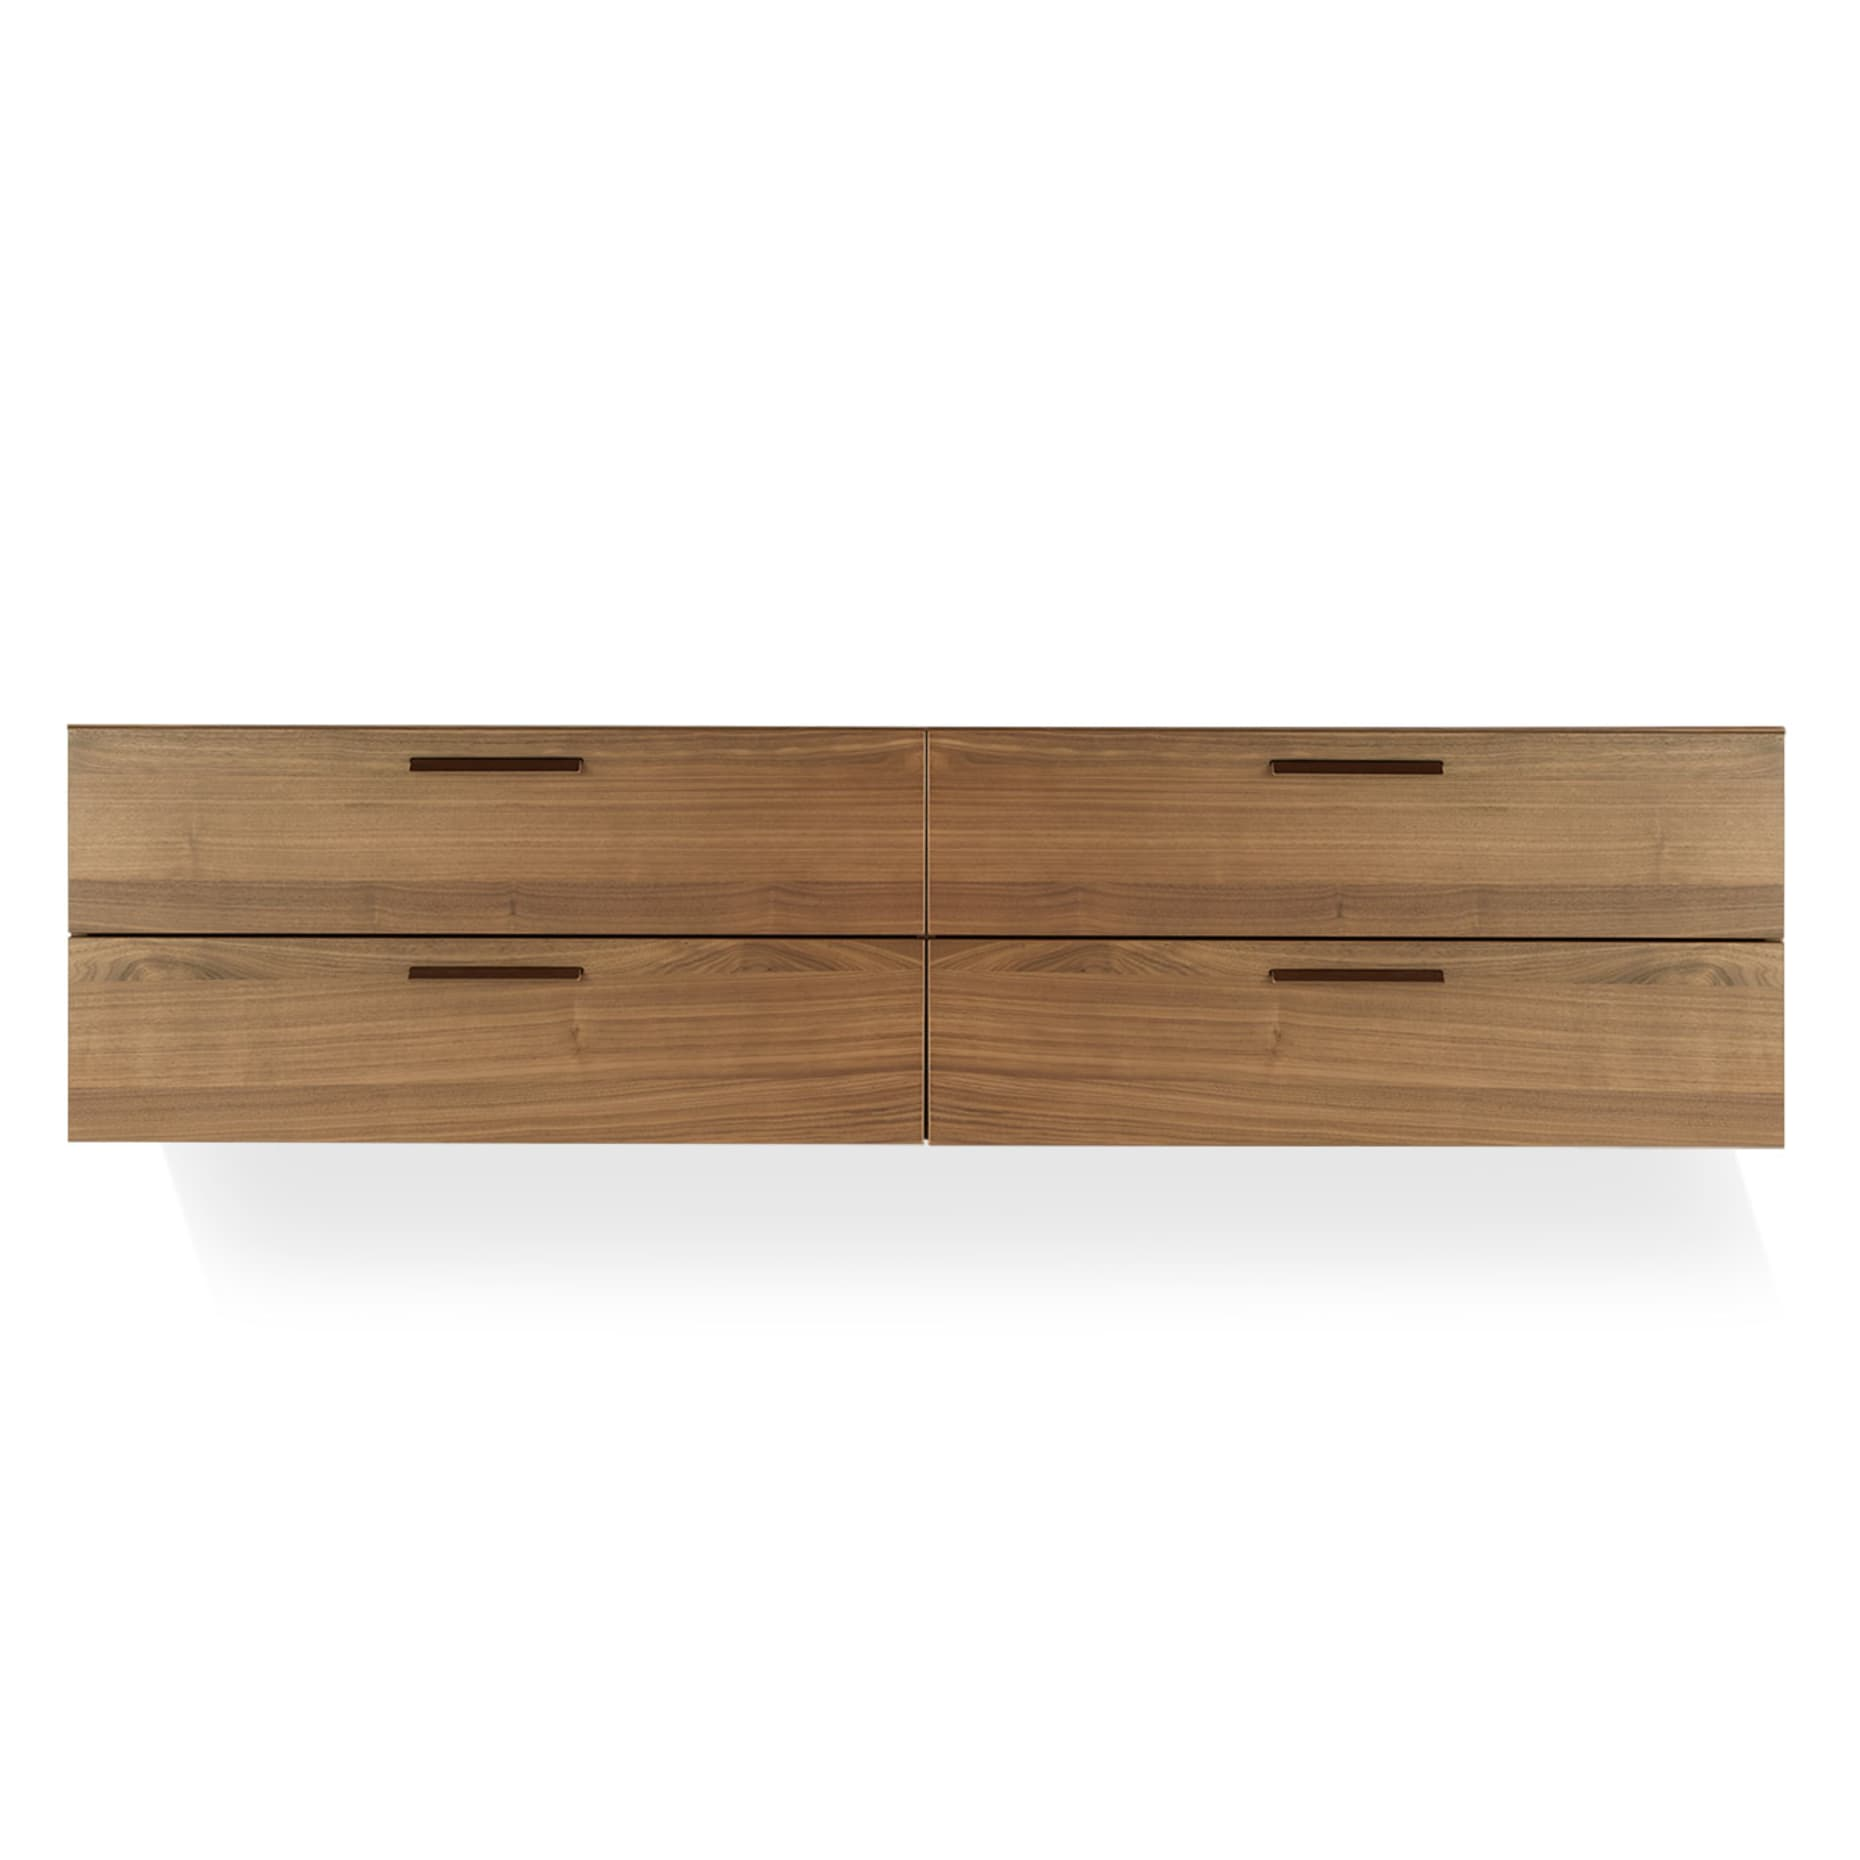 shale 2 door 2 drawer dresser walnut wall 2 1 1